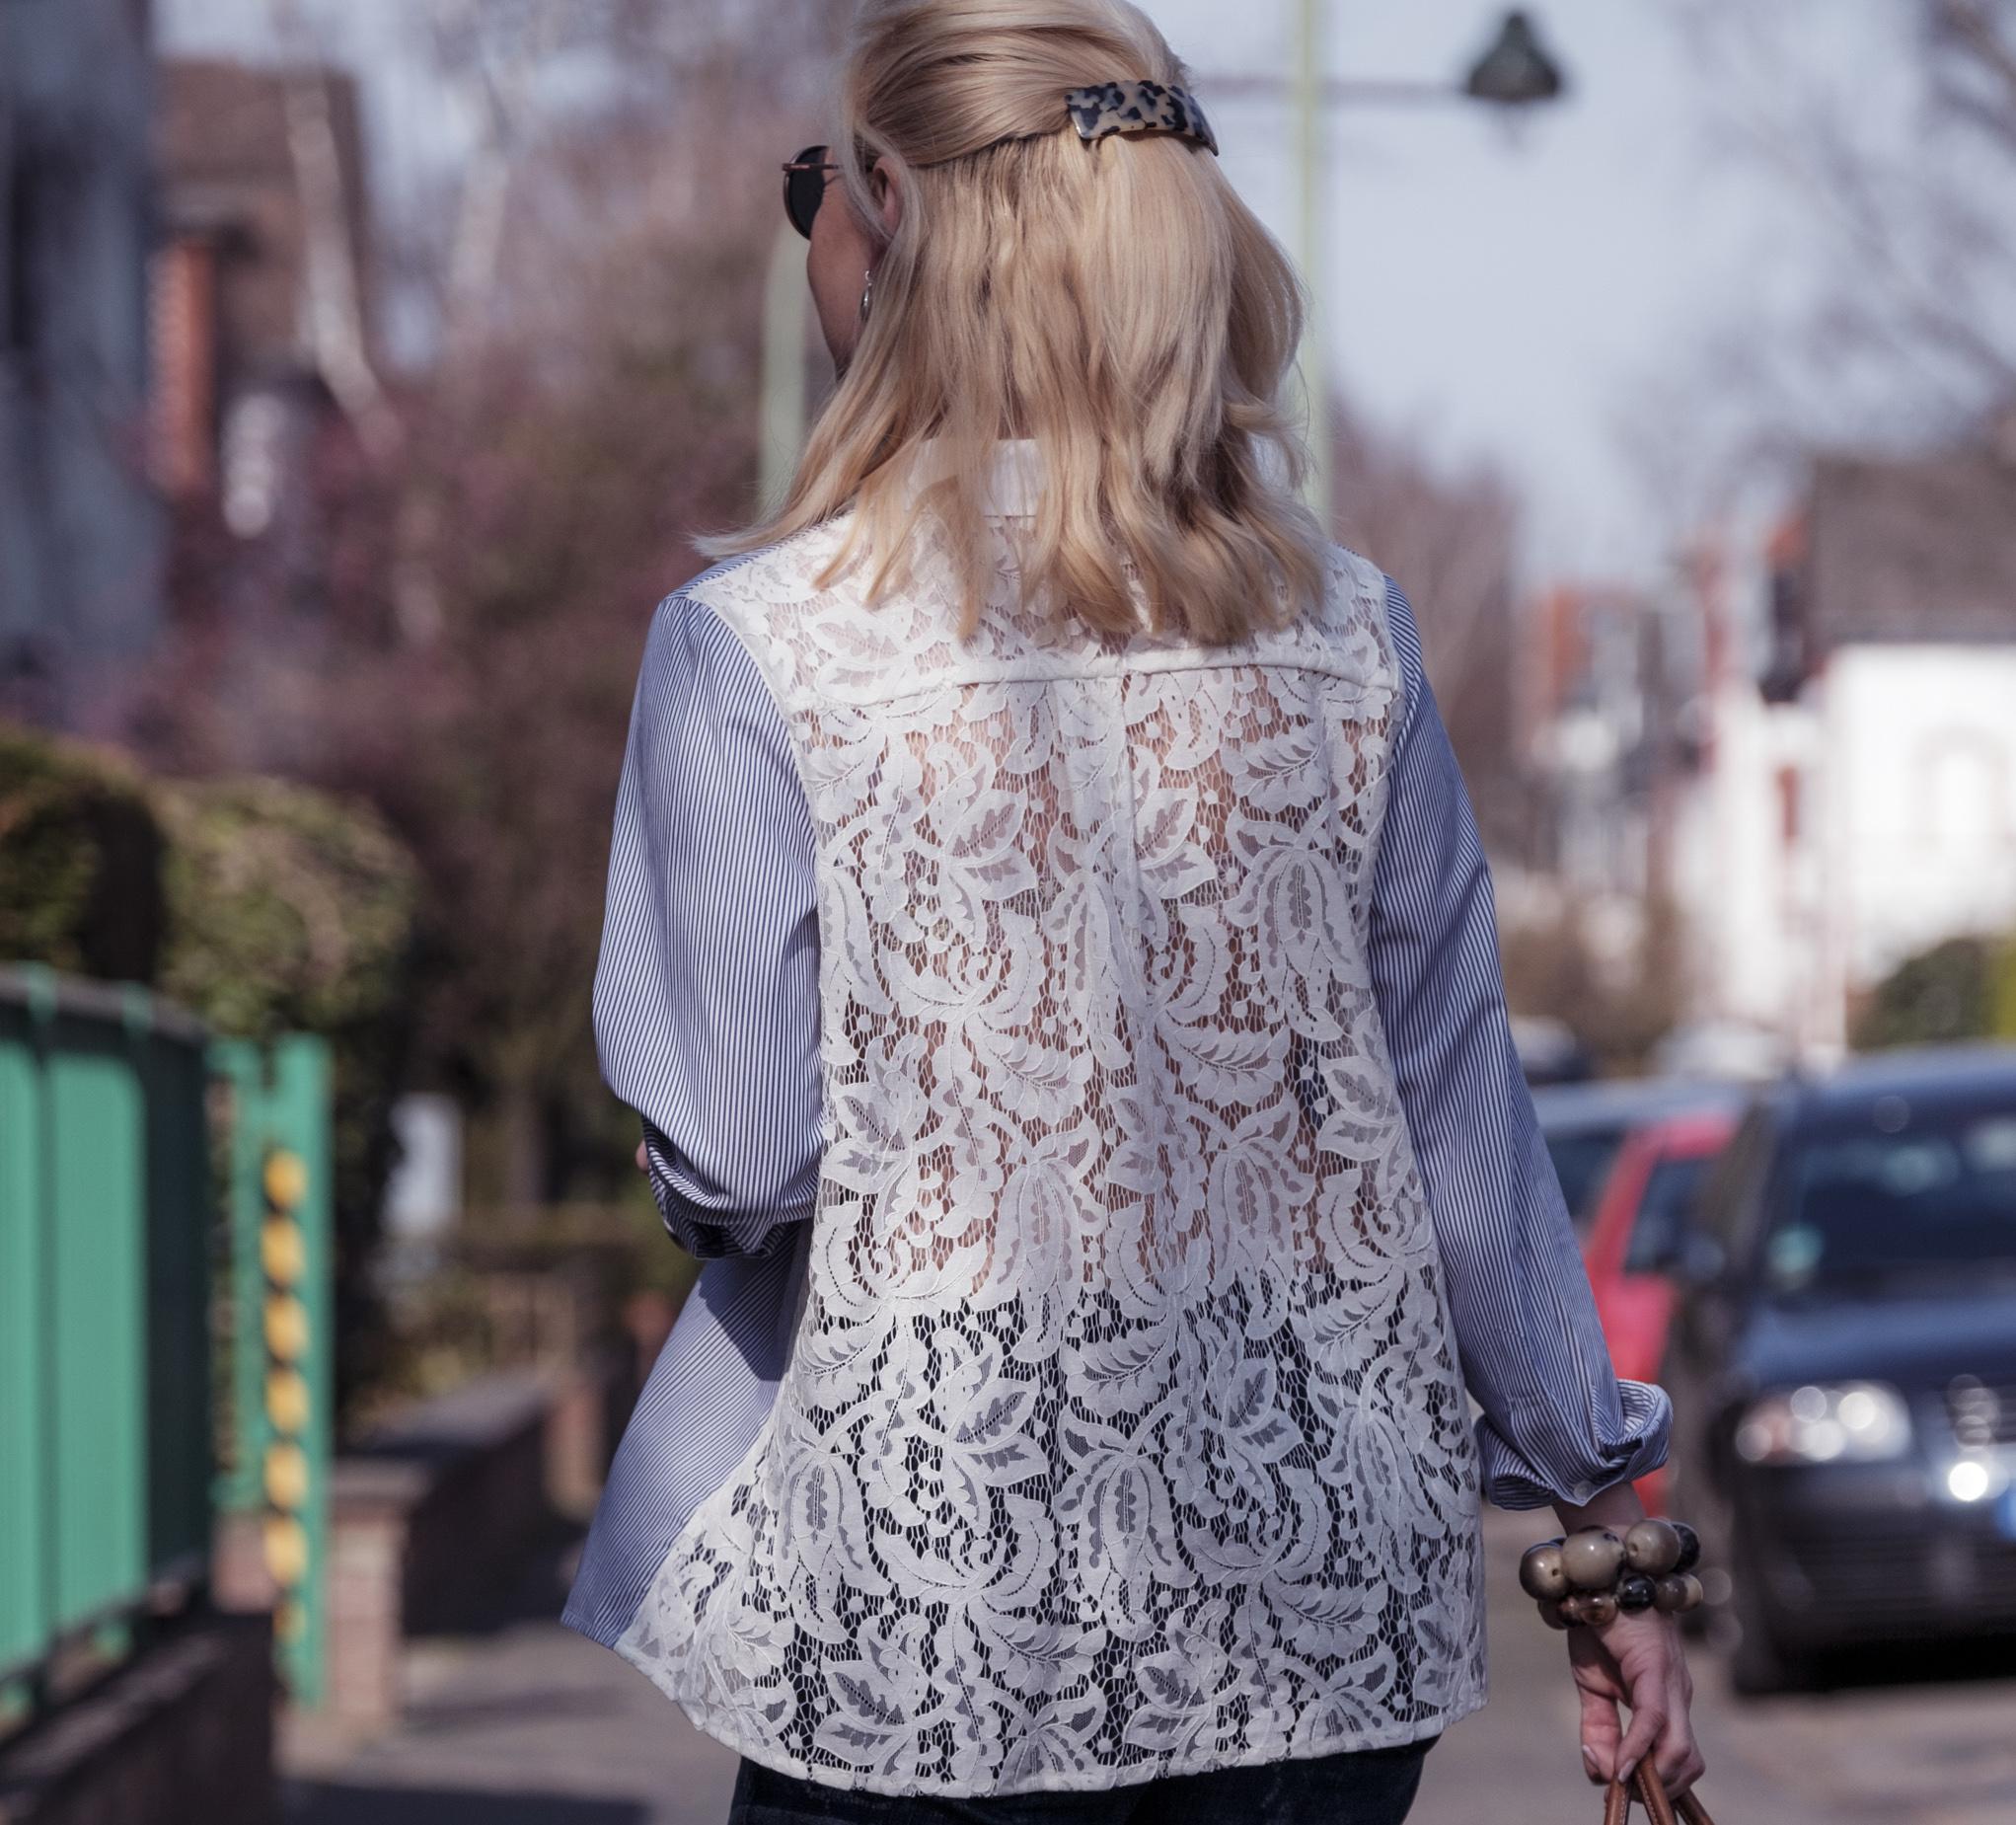 Sem Per Lei fashion, Sem Per Lei Mode, SemPerLei Mode, Bluse mit Spitze, Fashion-Blog, Lieblingsstil.com,